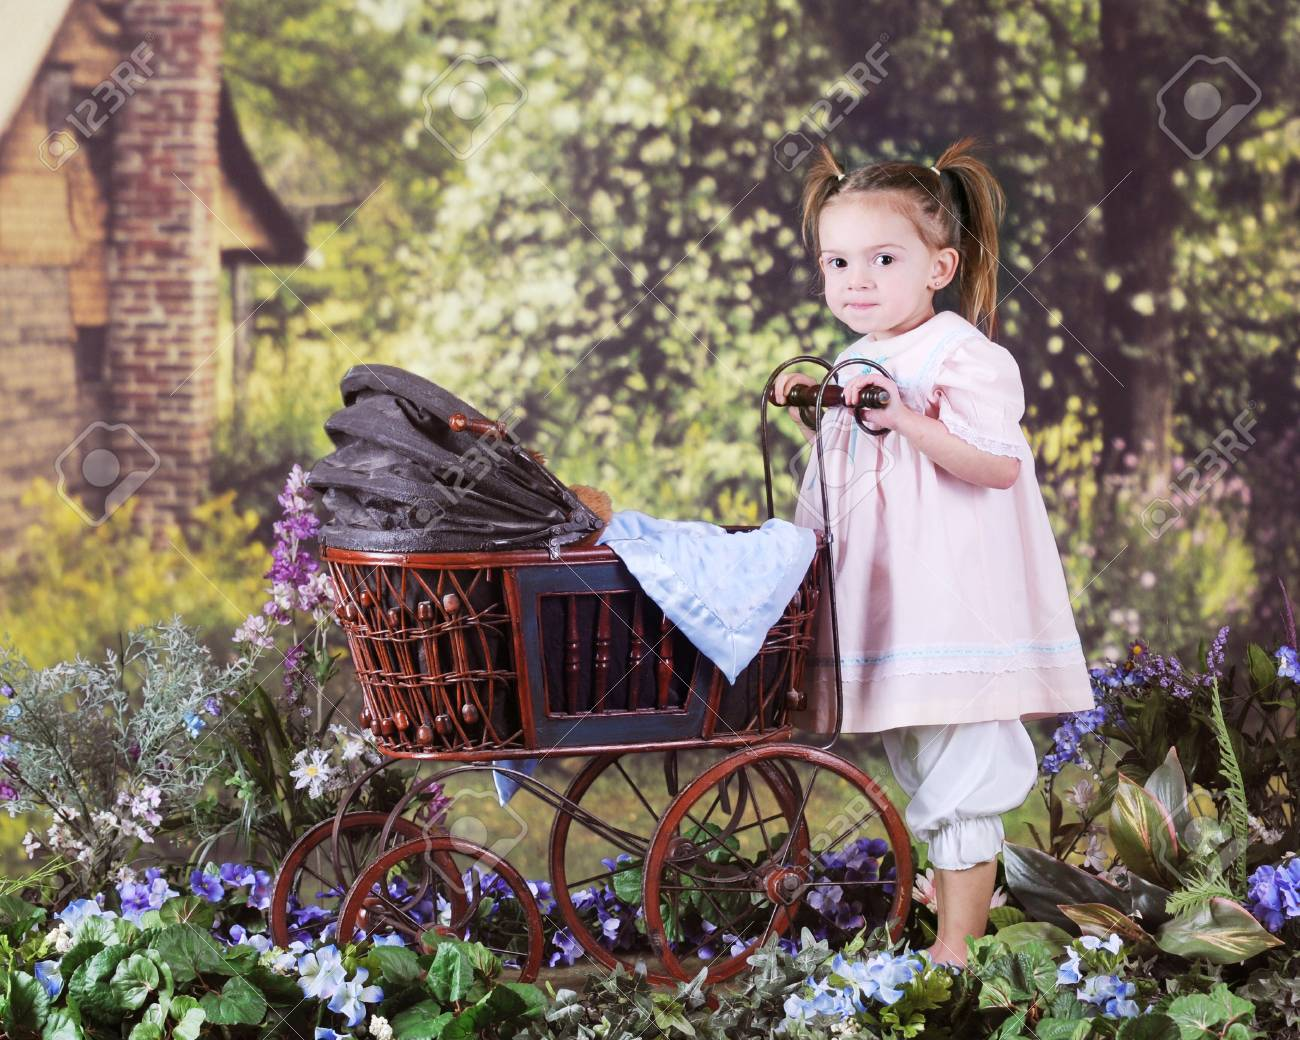 A beautiful preschooler pushing an antique doll buggy in a rustic, rural setting. Stock Photo - 17147962